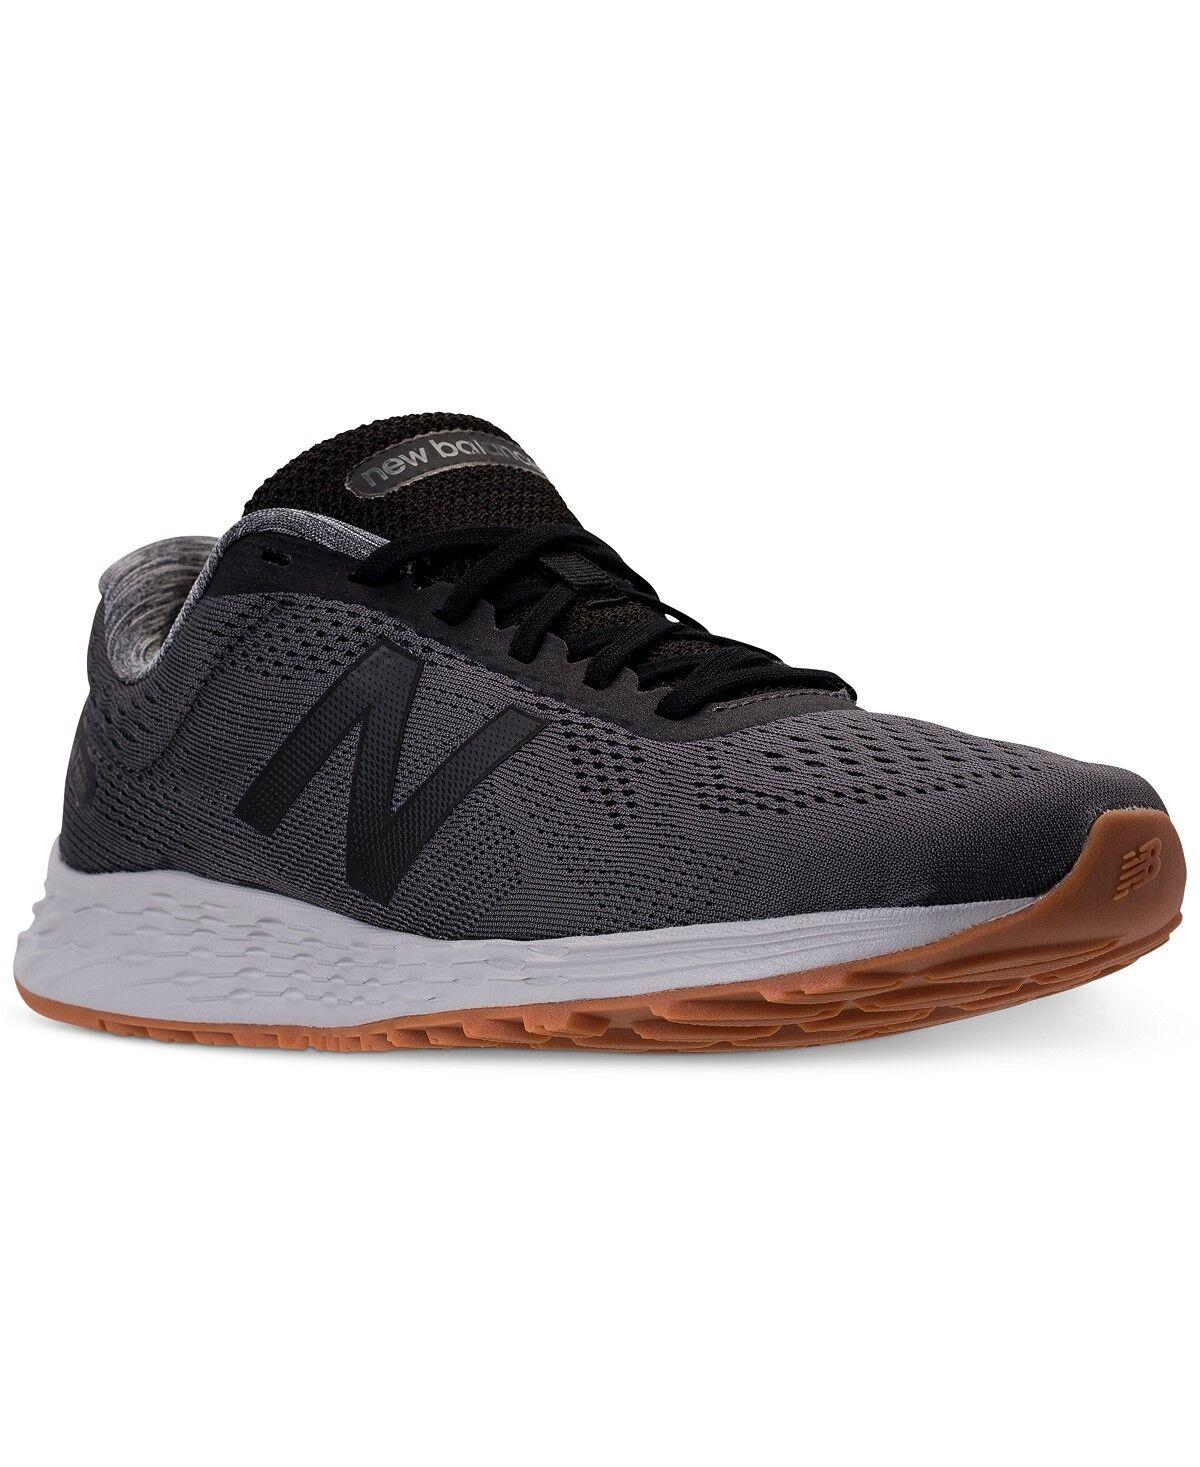 NIB New Balance hommes Foam Fresh Foam hommes Arishi Chaussures Med&4E WIDE Dark gris MARISLB1 4634f0